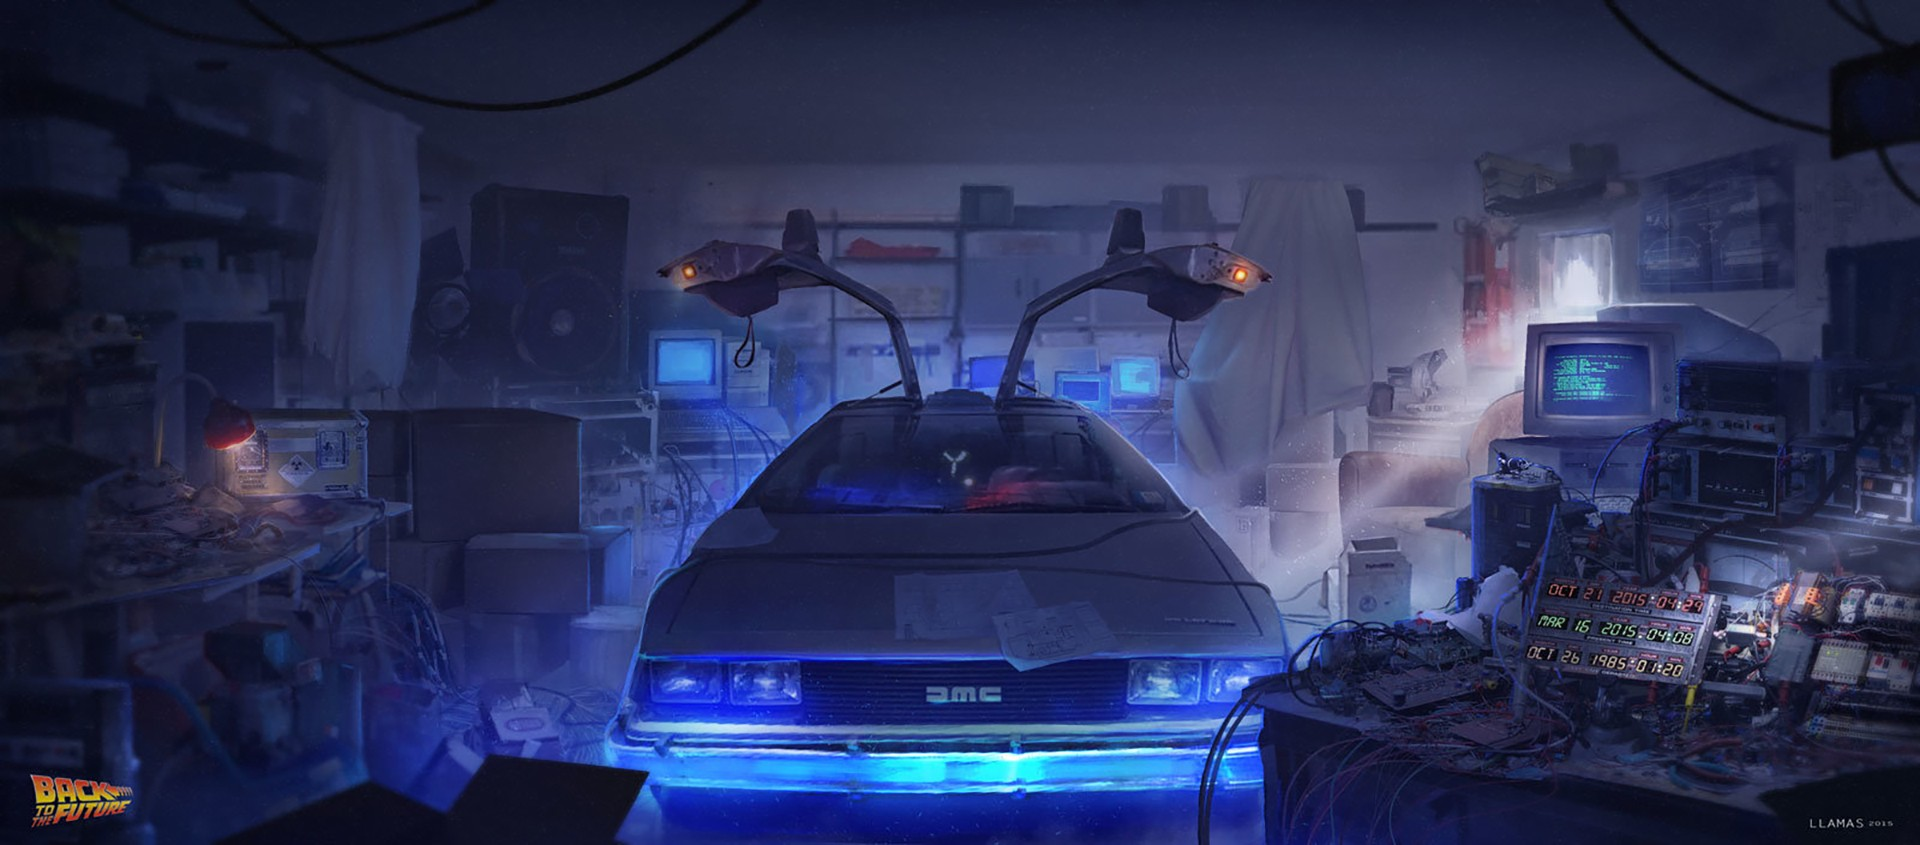 General 1920x845 digital art DeLorean time travel Back to the Future